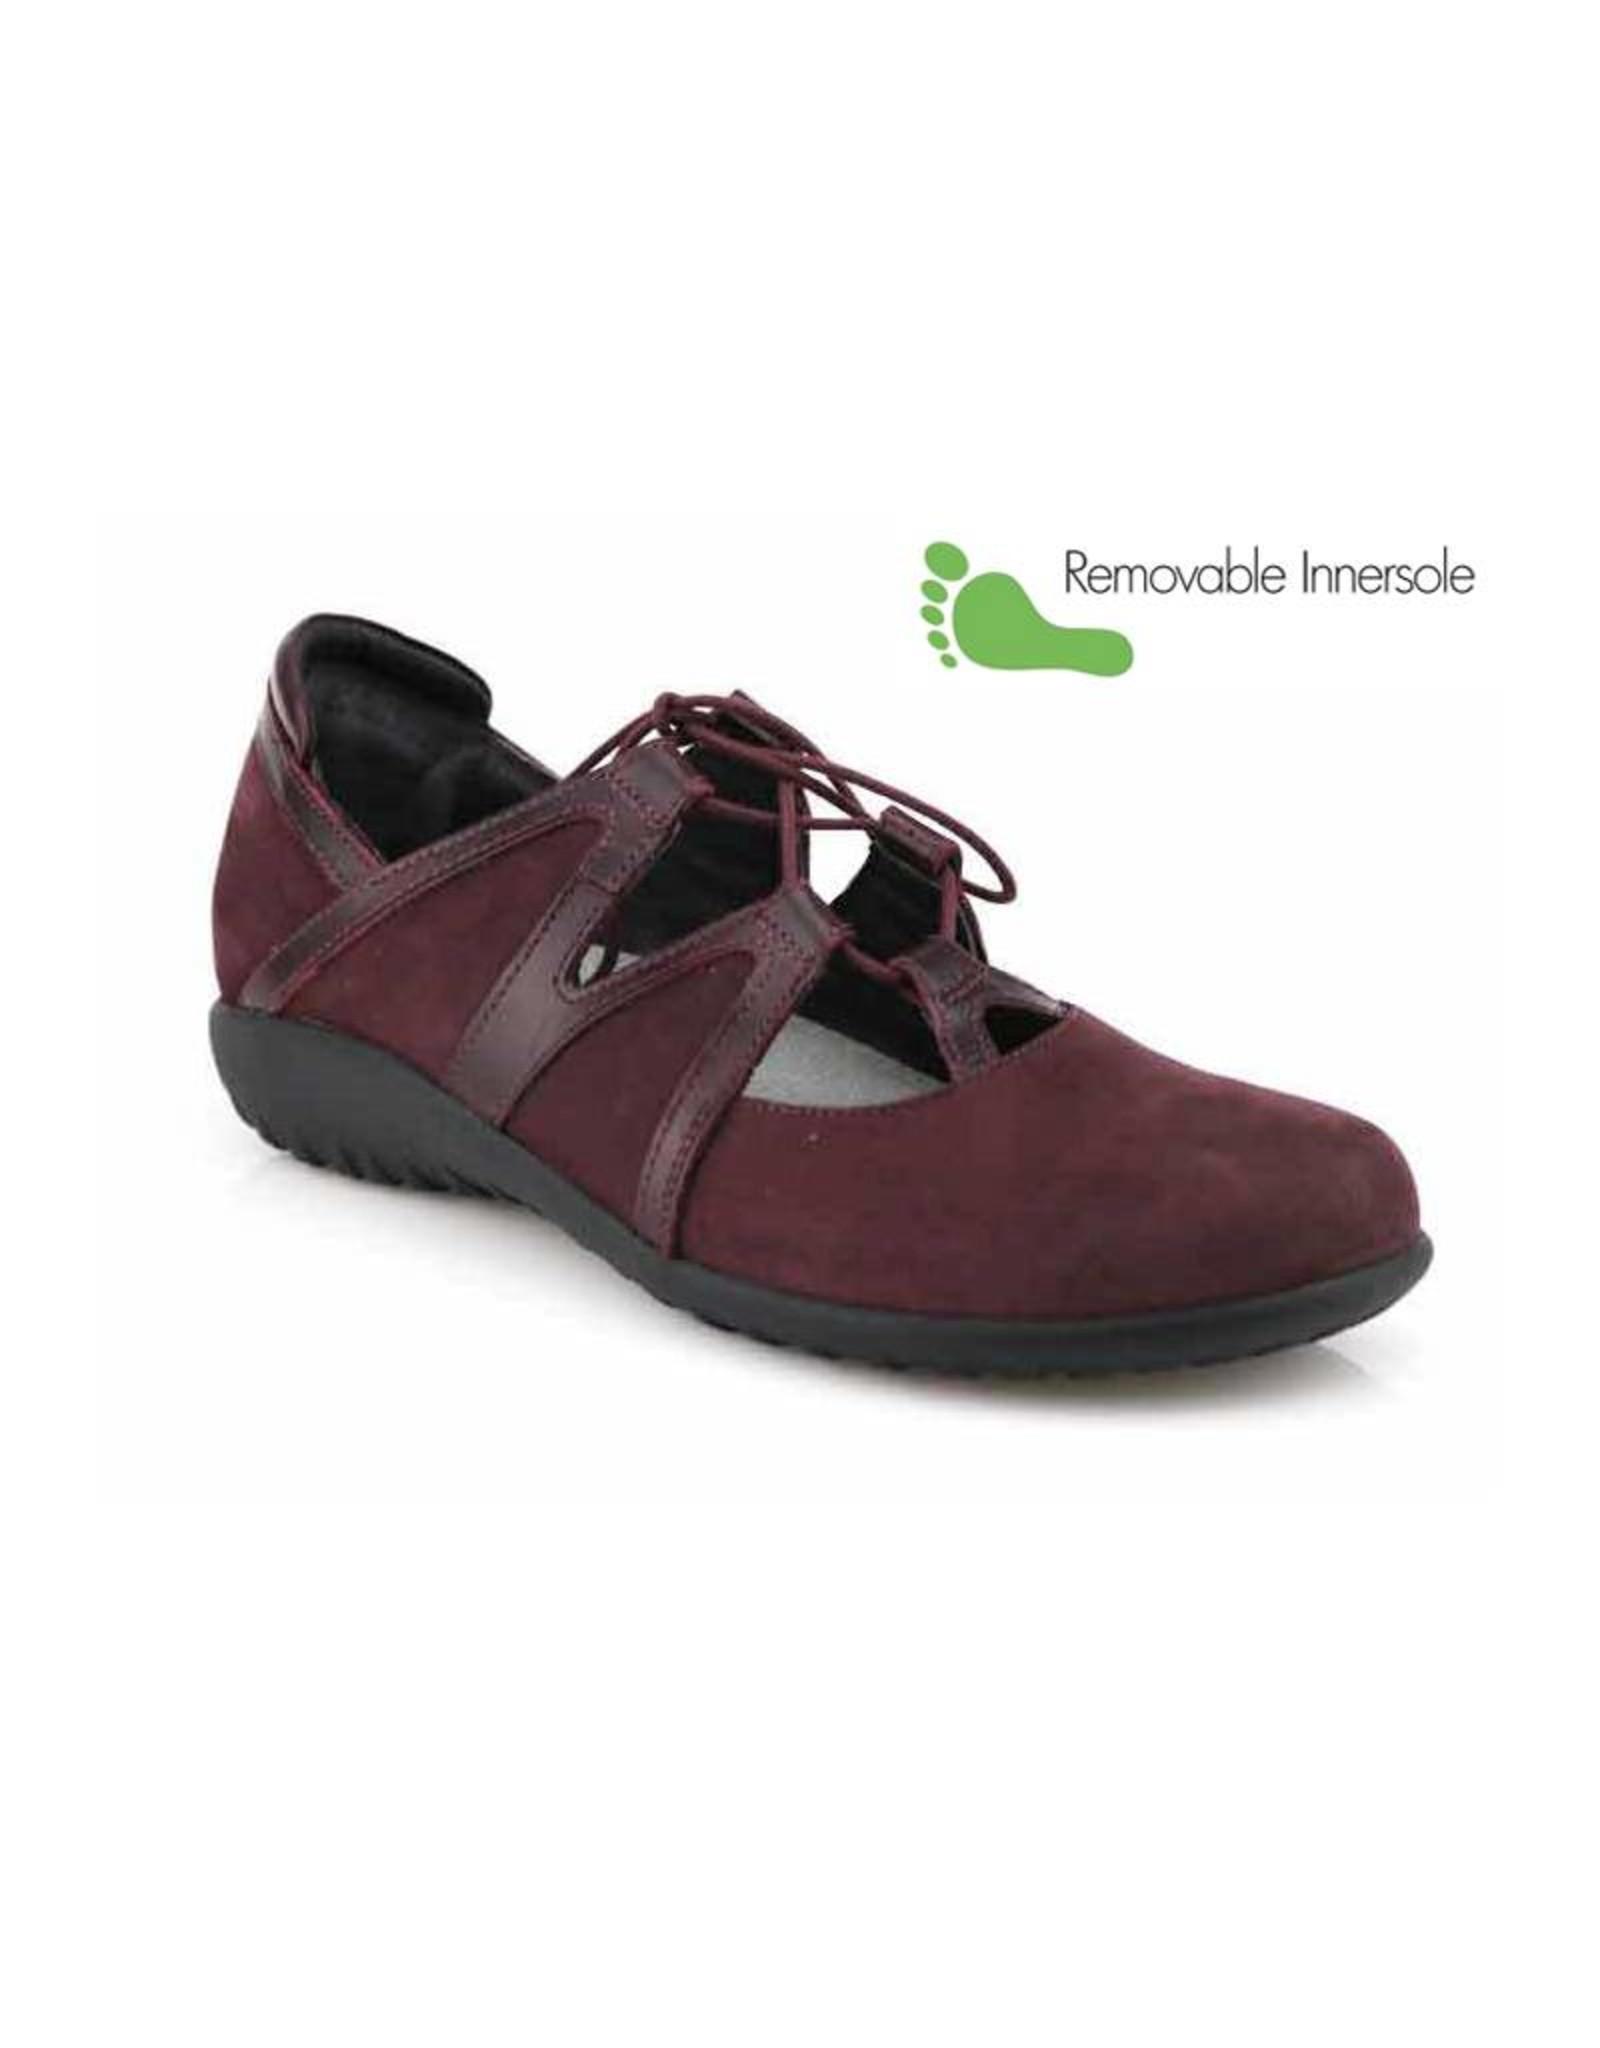 Naot Footwear Timu Bordeaux Violet Combo